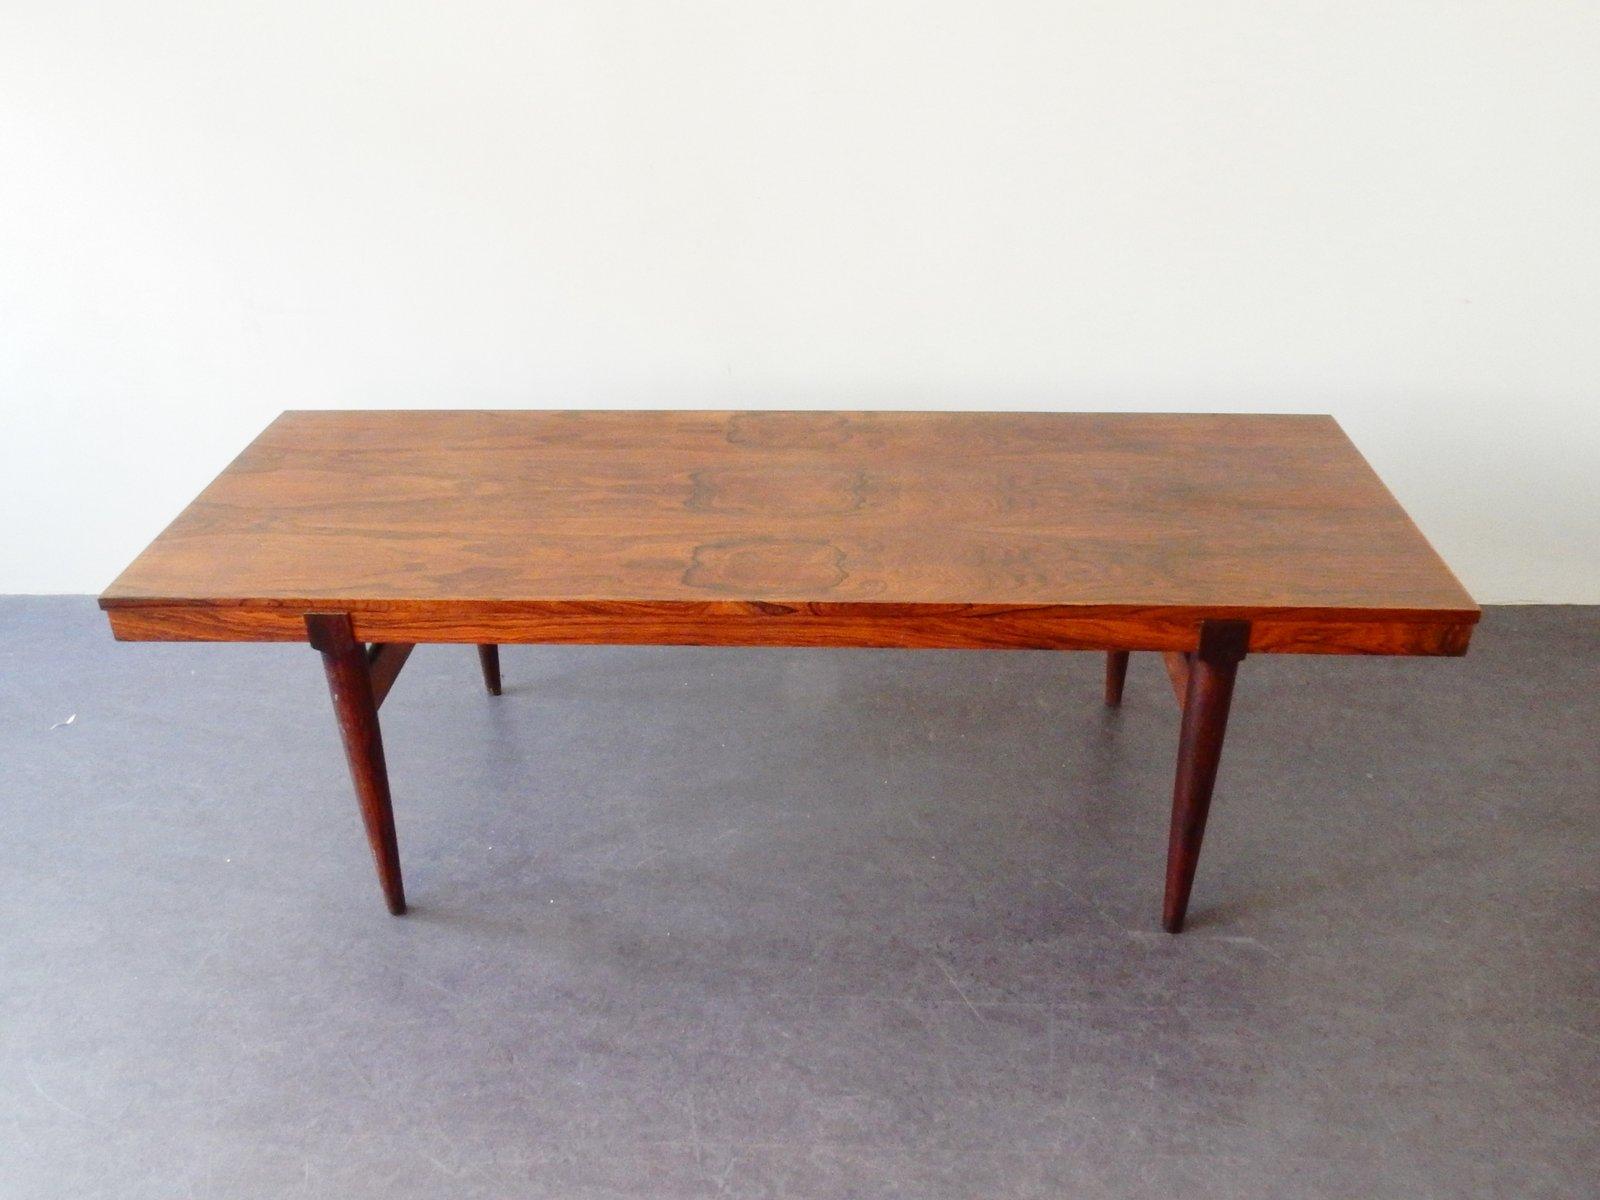 table basse extensible en palissandre danemark en vente sur pamono. Black Bedroom Furniture Sets. Home Design Ideas